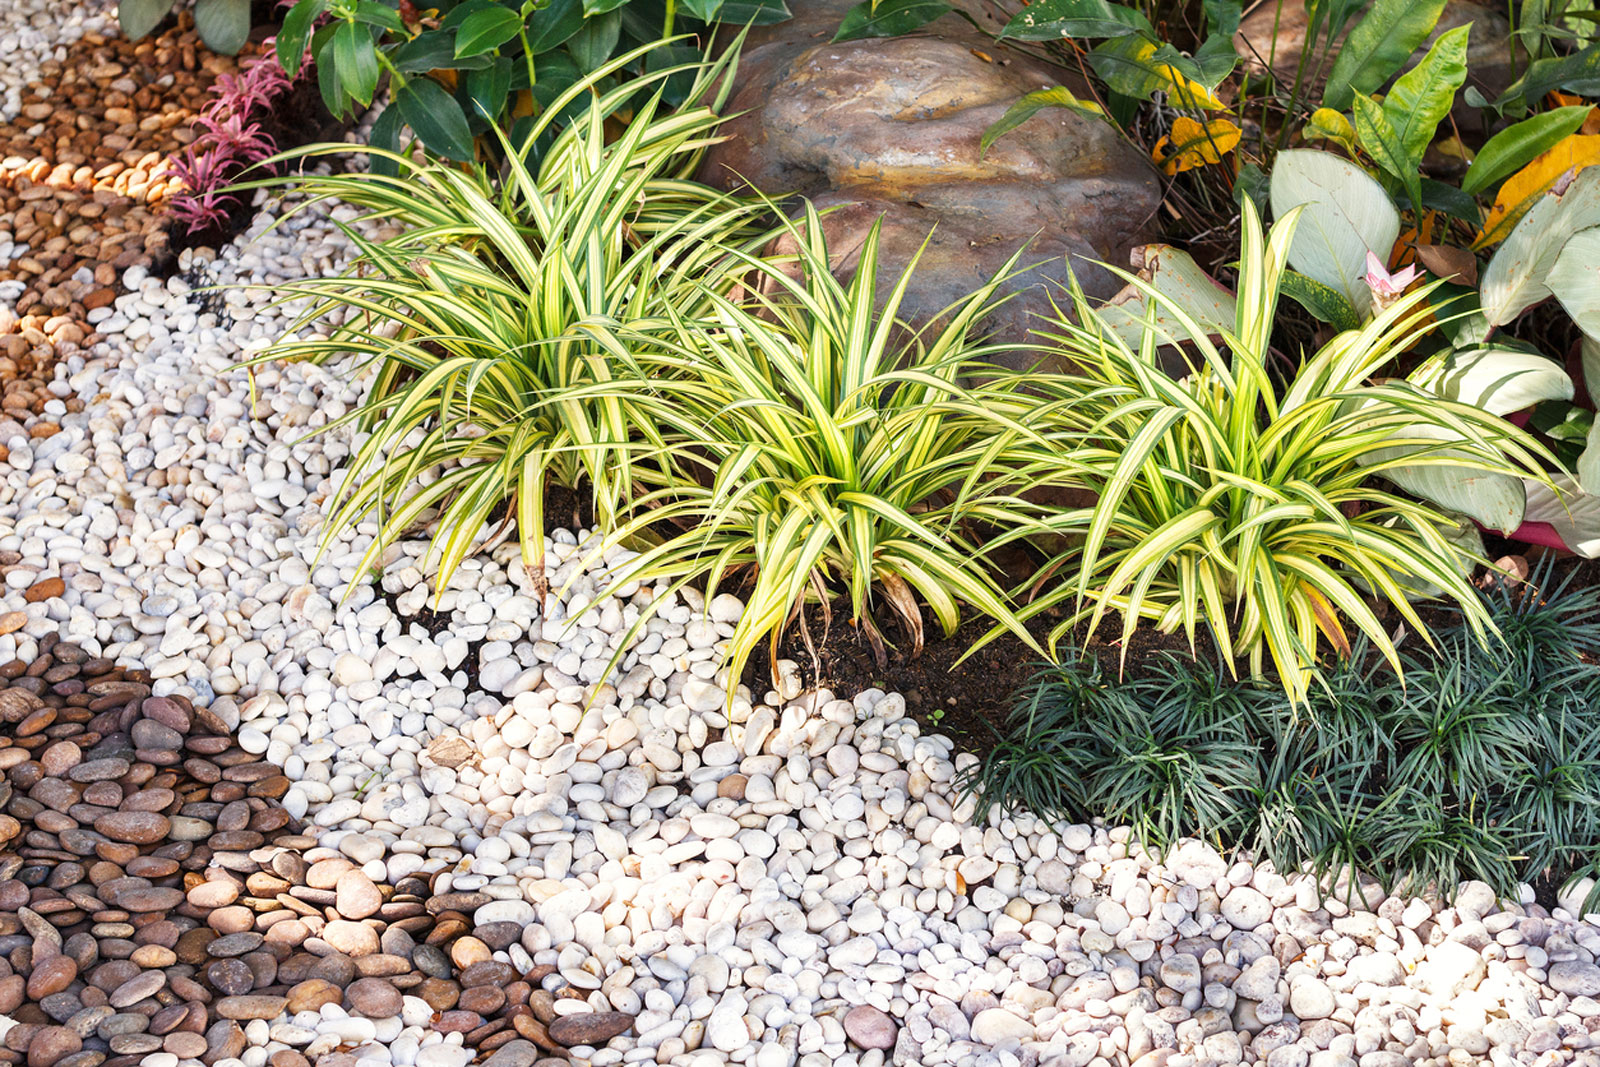 Gravel Garden Designs: Learn About Different Types Of Gravel Gardens